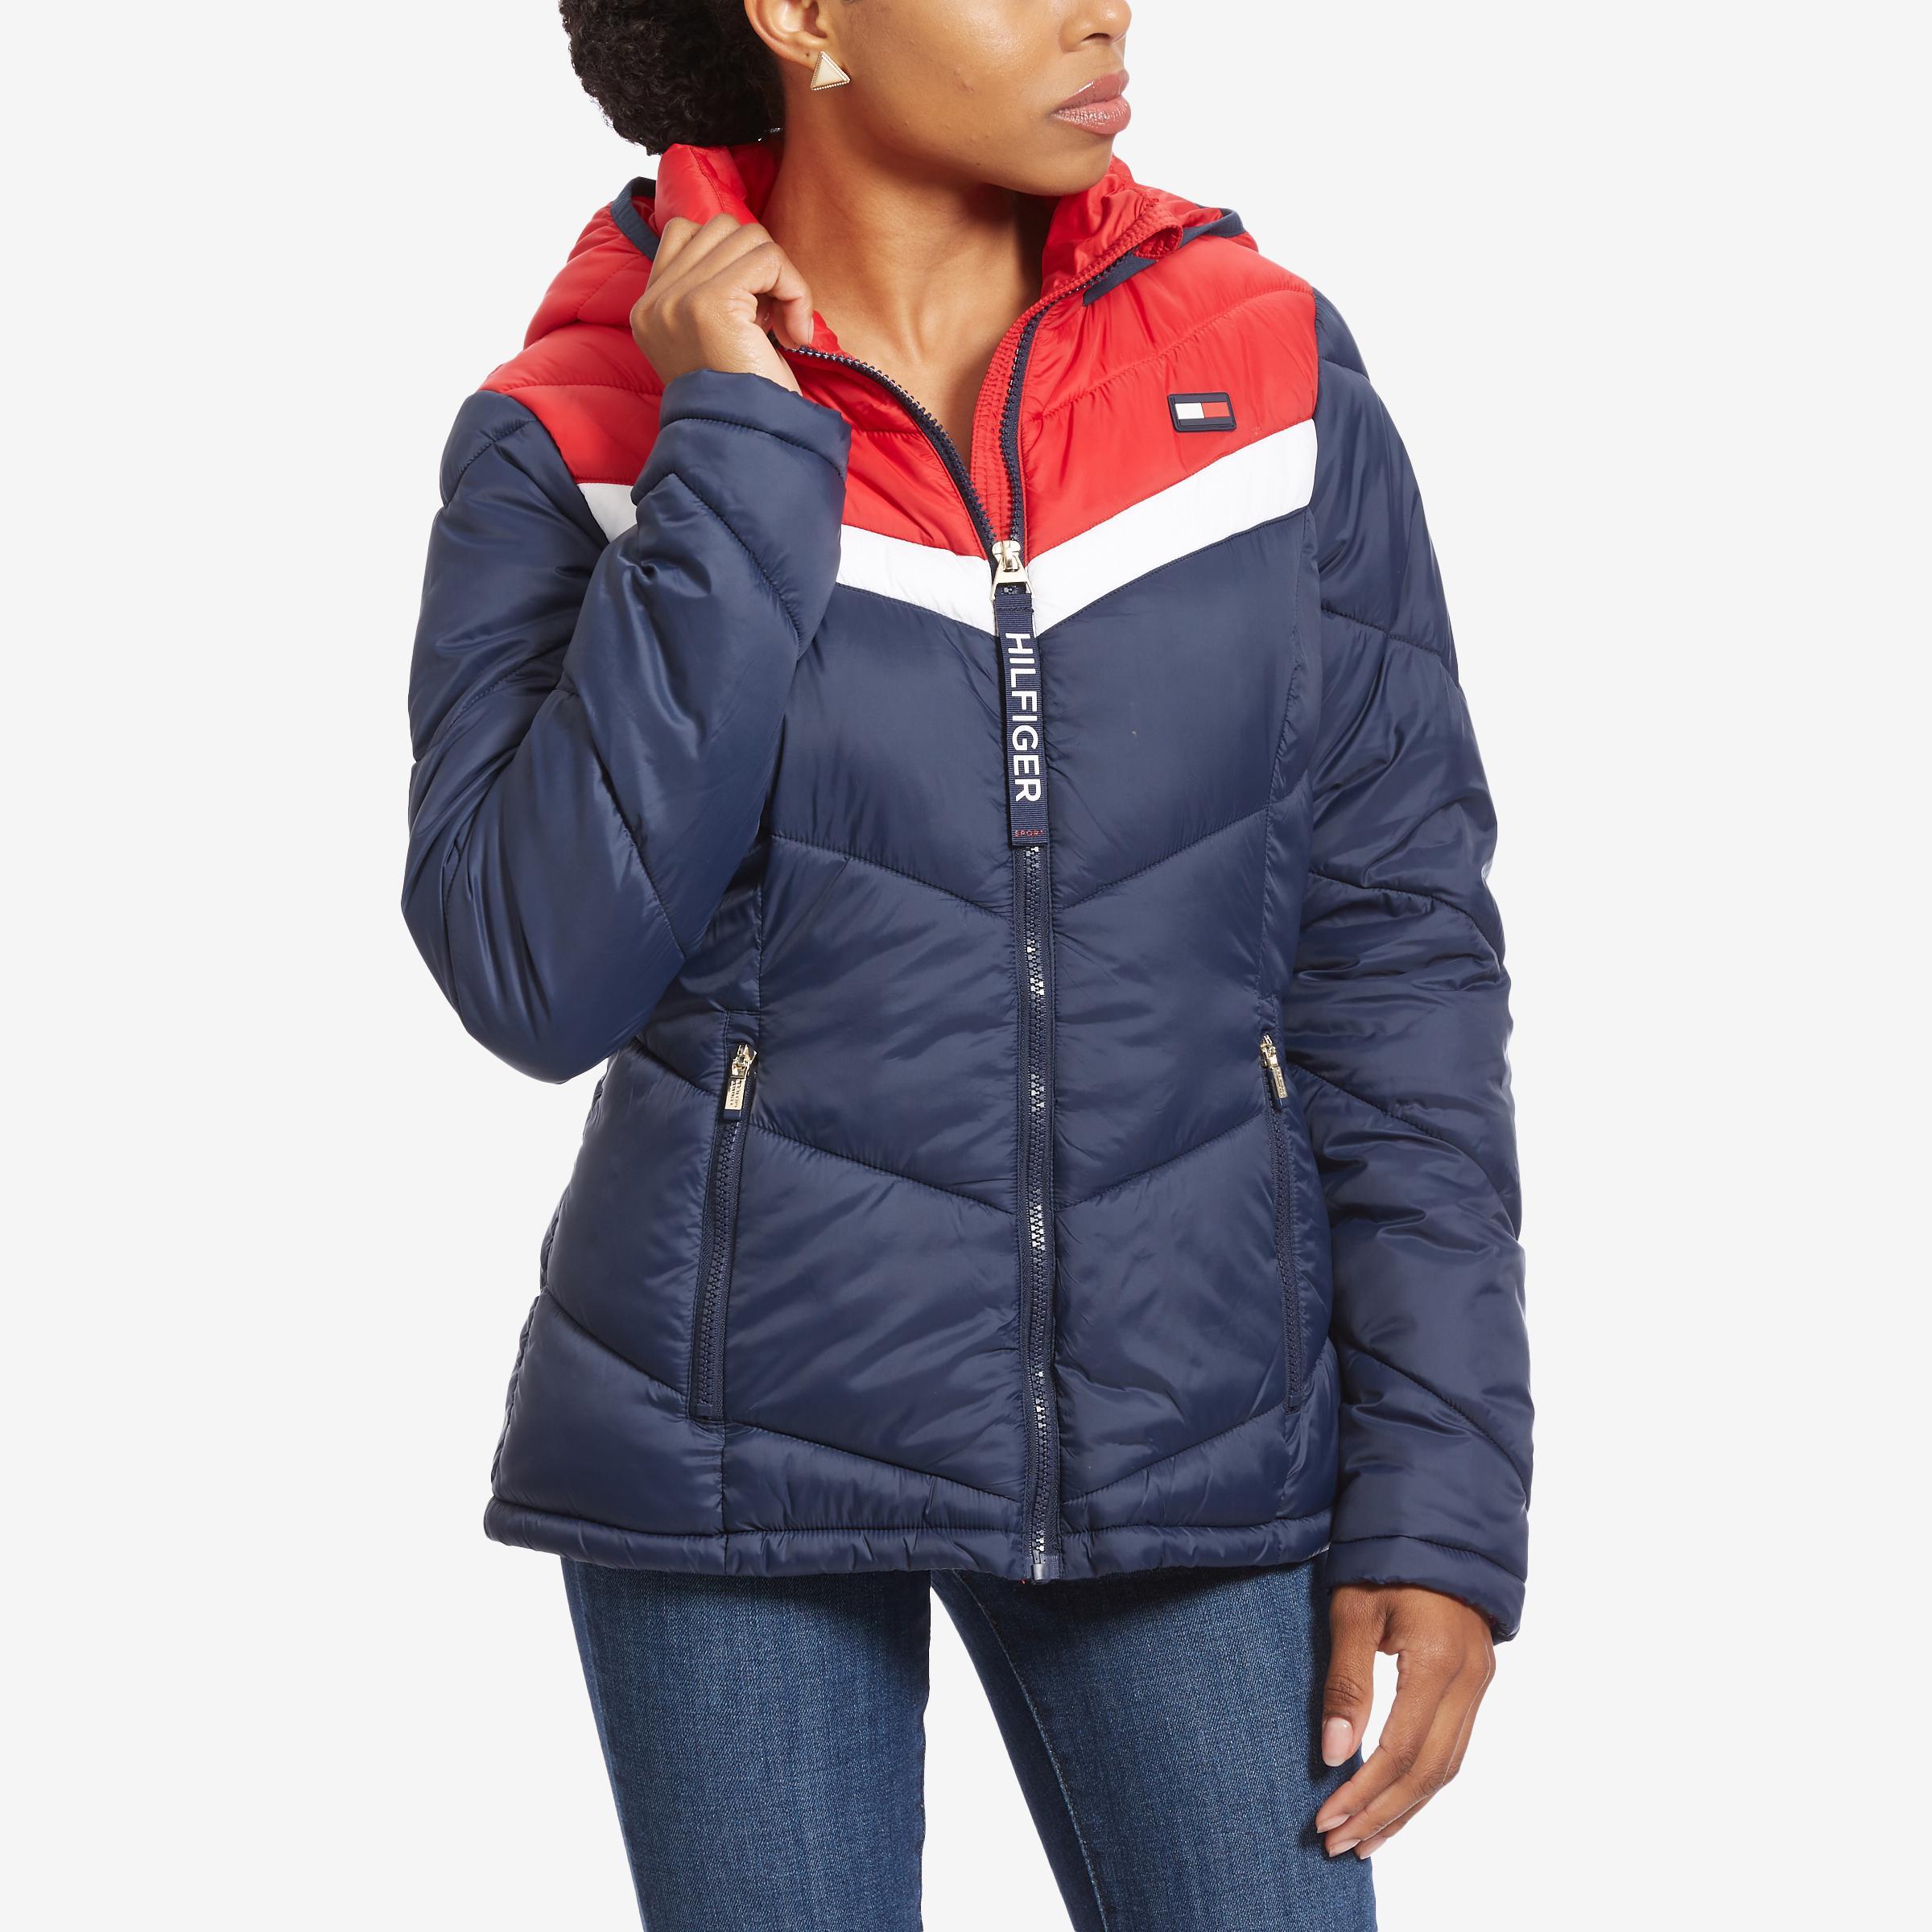 Chevron Hooded Jacket